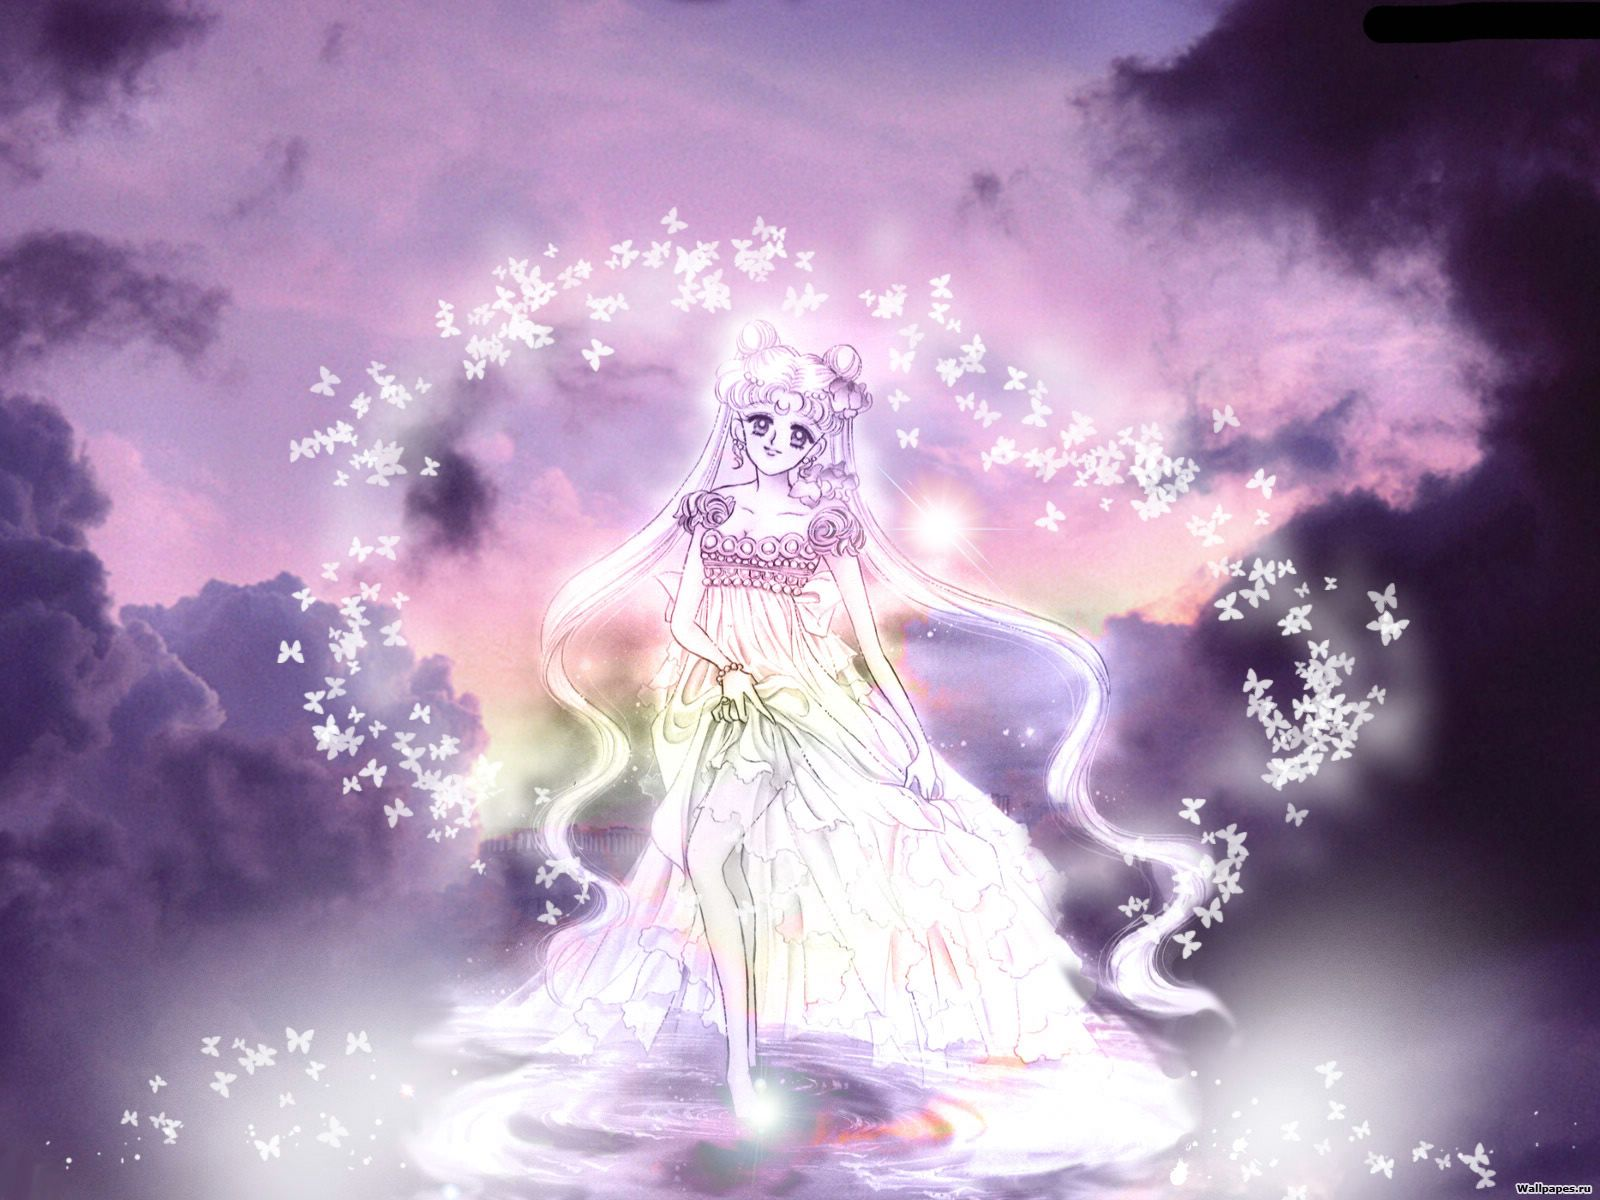 http://1.bp.blogspot.com/-Oqrqy1BZ970/TaHKvyo6kSI/AAAAAAAABJg/kGcJeSP5xJk/s1600/%25255BAnimePaper%25255Dwallpapers_Sailor-Moon_lafhaha_14067.jpeg